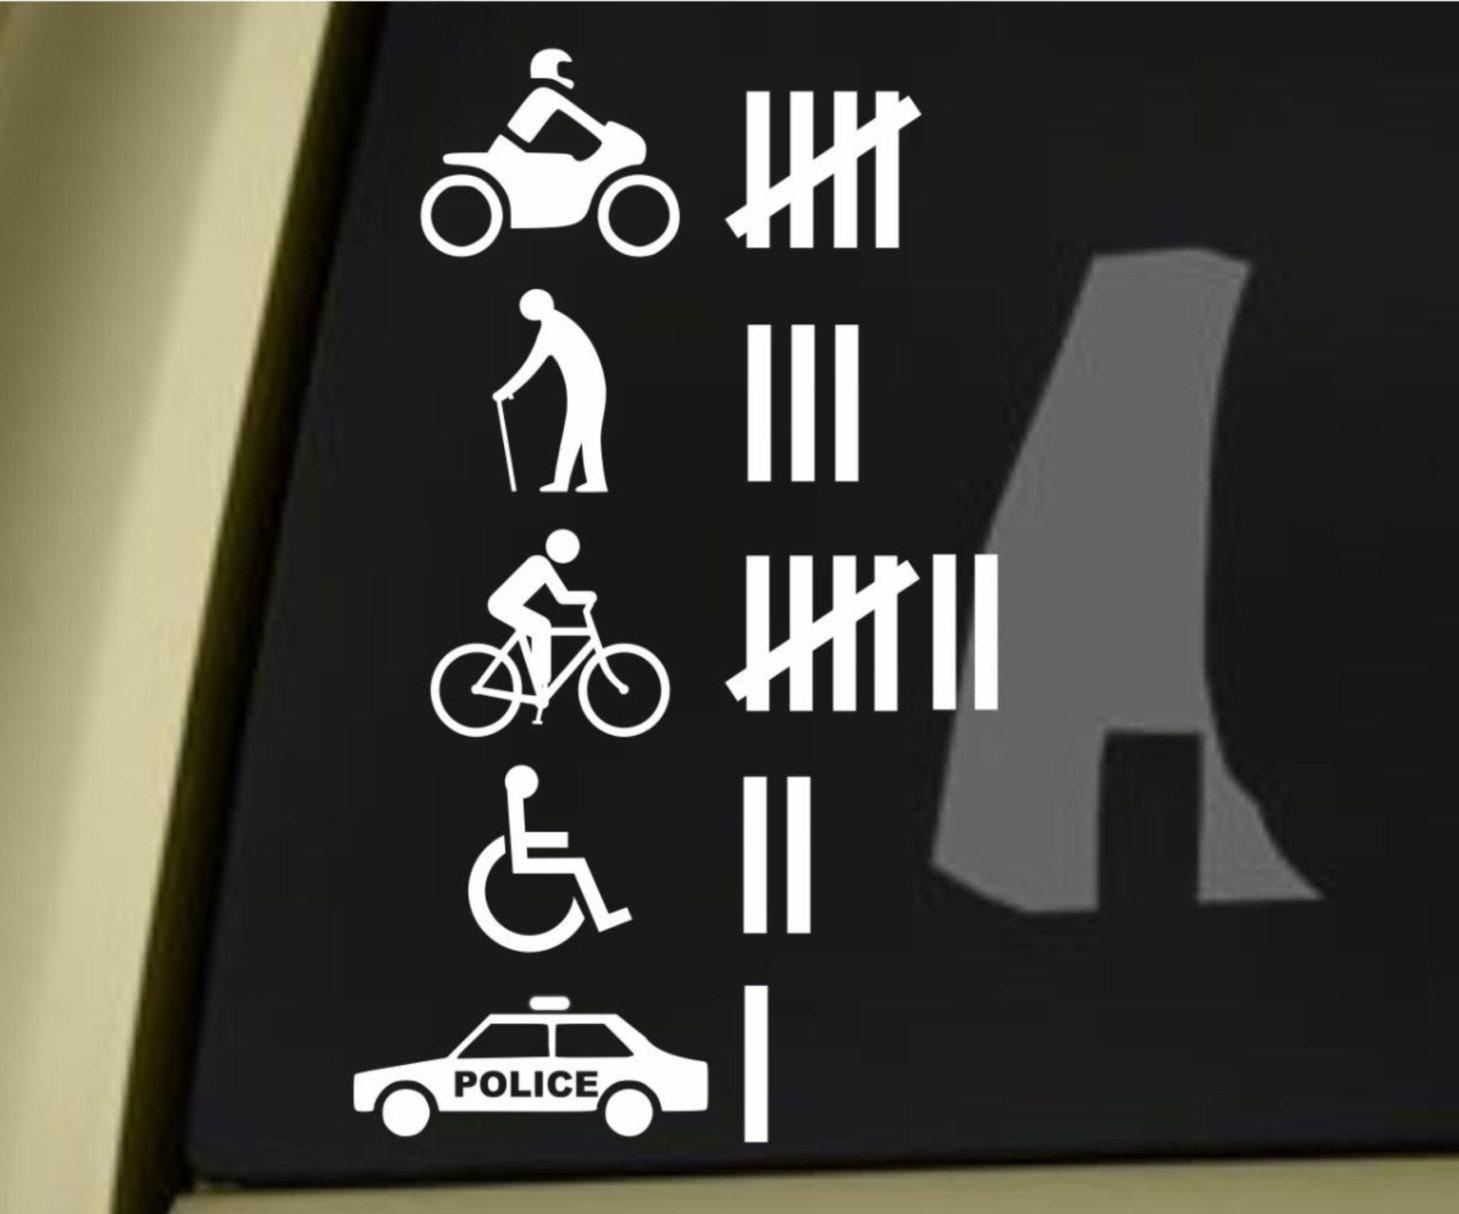 accident hit kill count funny bumper sticker vinyl decal jdm. Black Bedroom Furniture Sets. Home Design Ideas